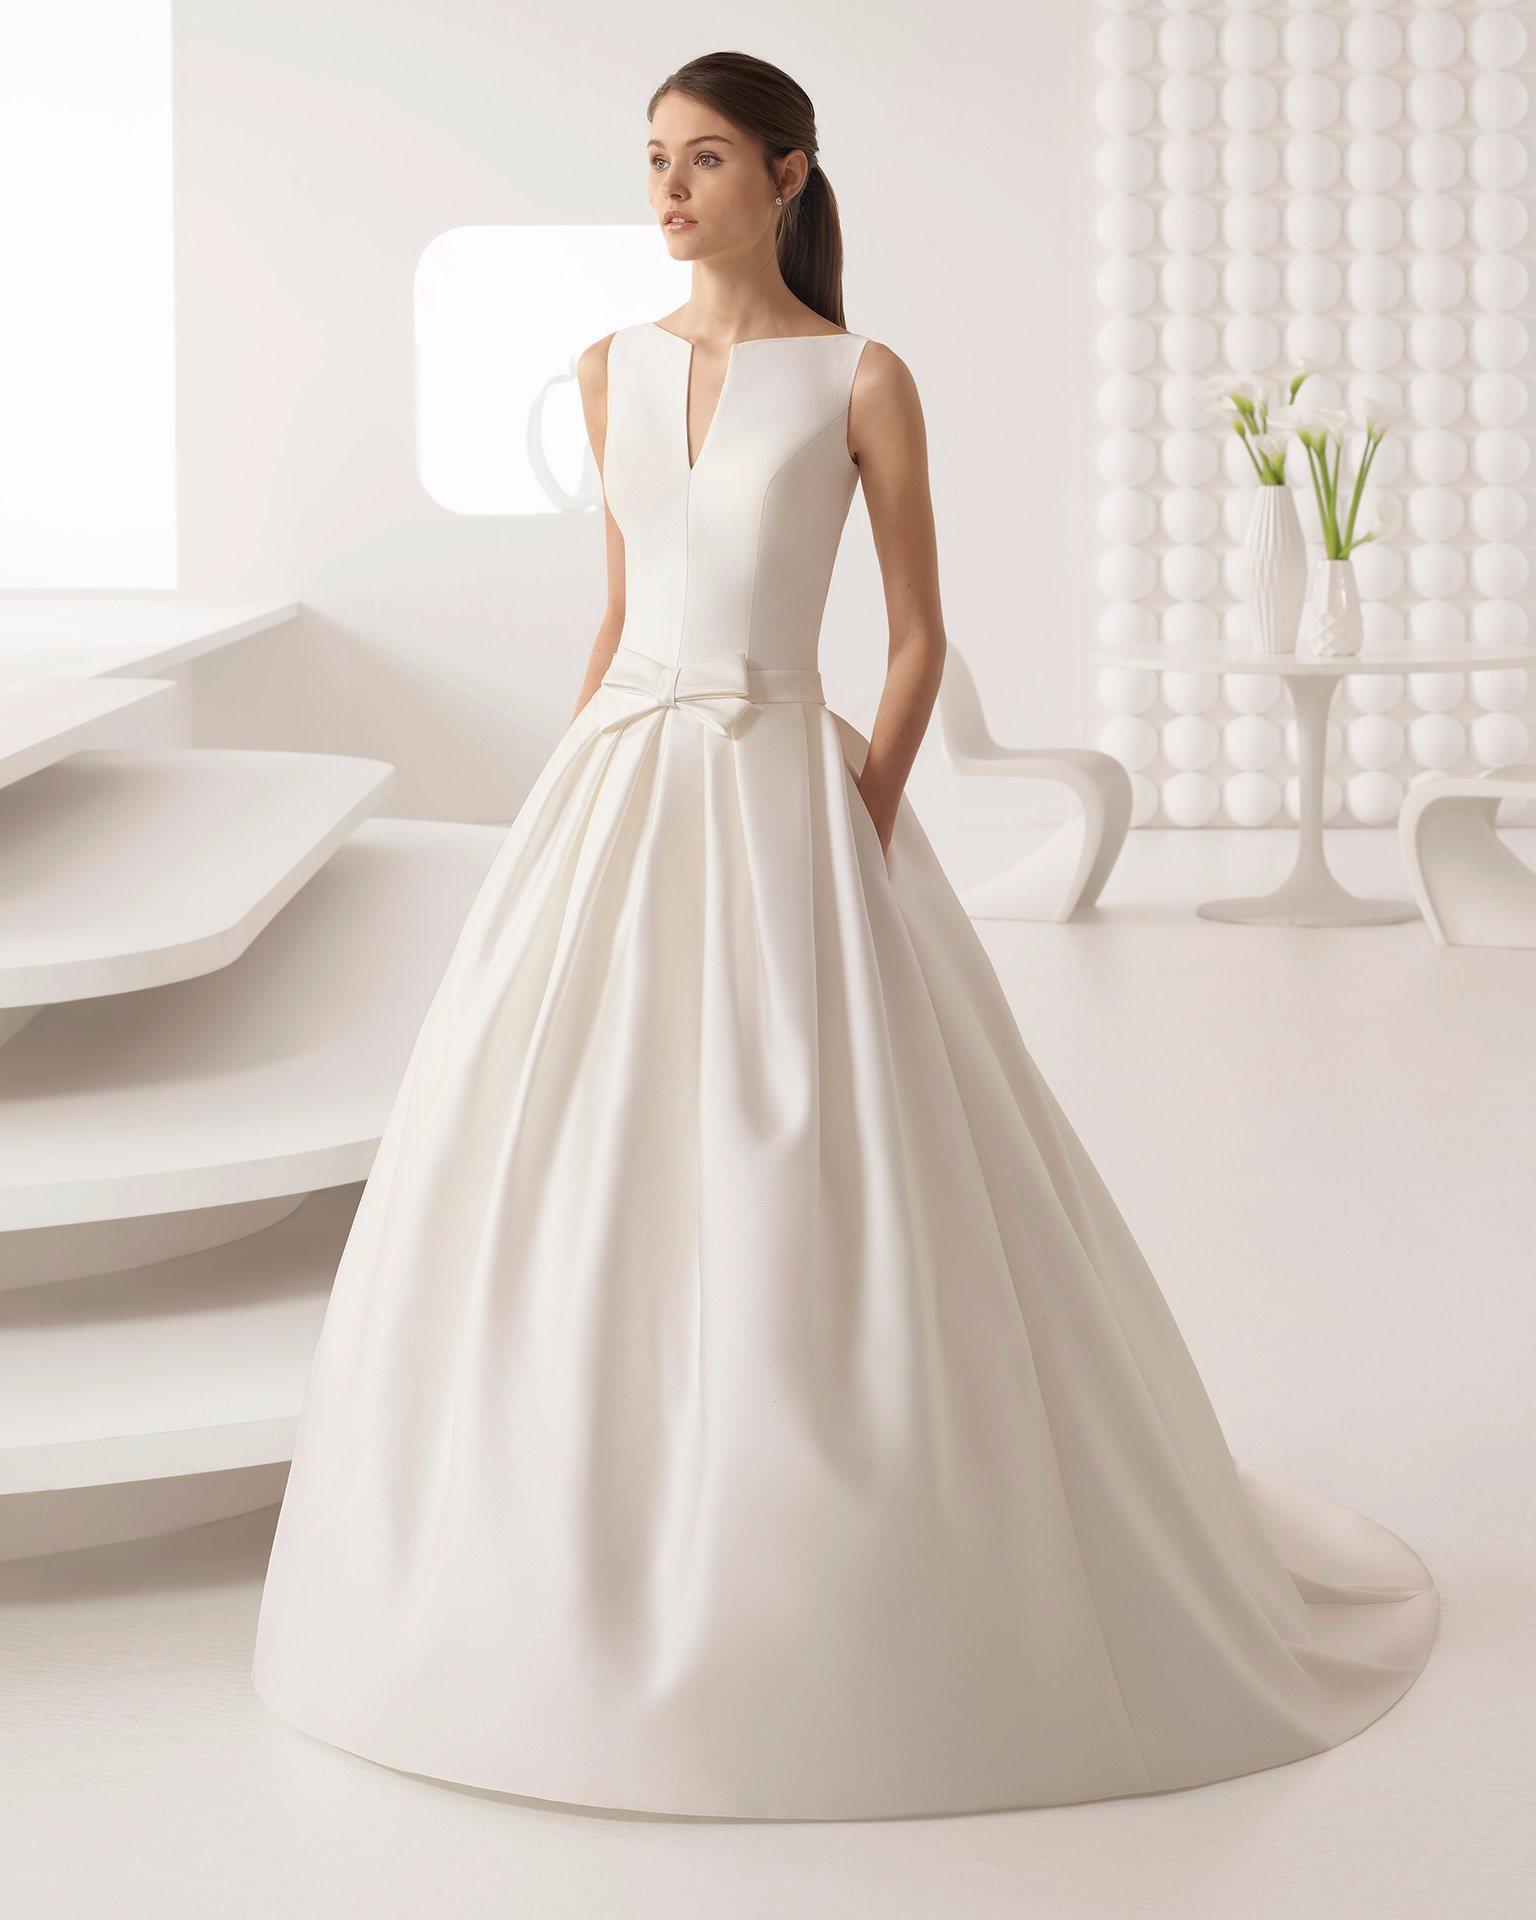 elegant simple wedding dress off 20   medpharmres.com